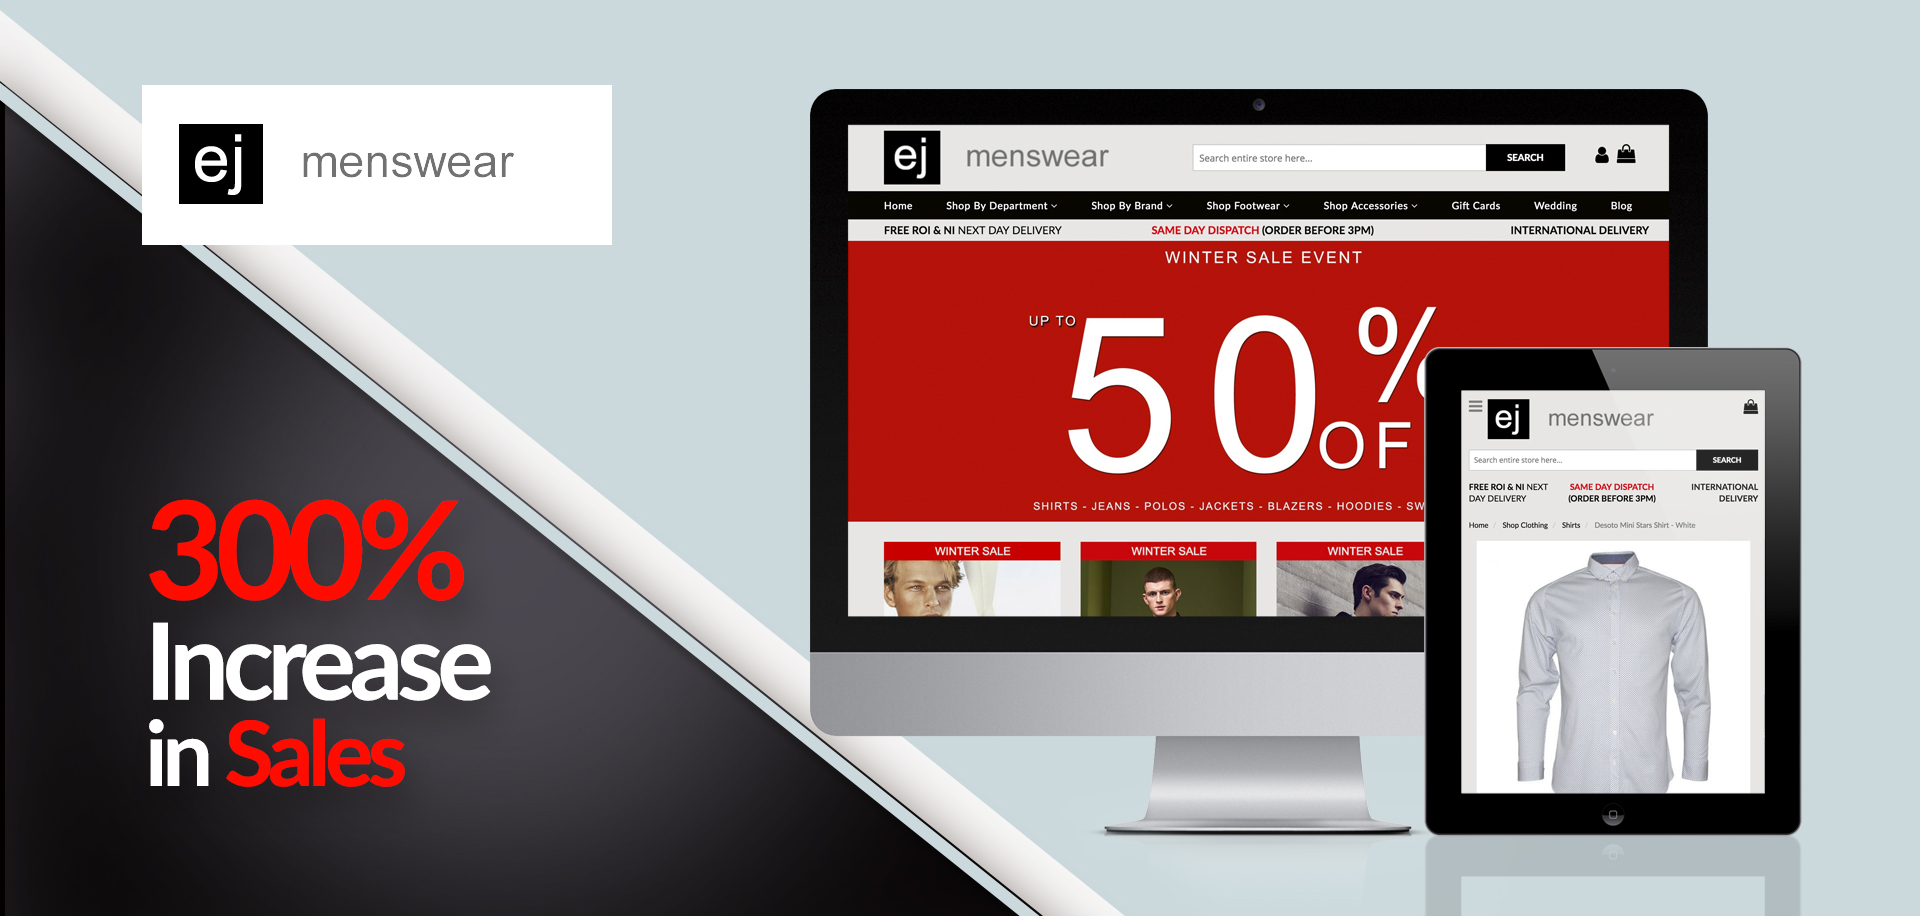 EJ Menswear SEO services